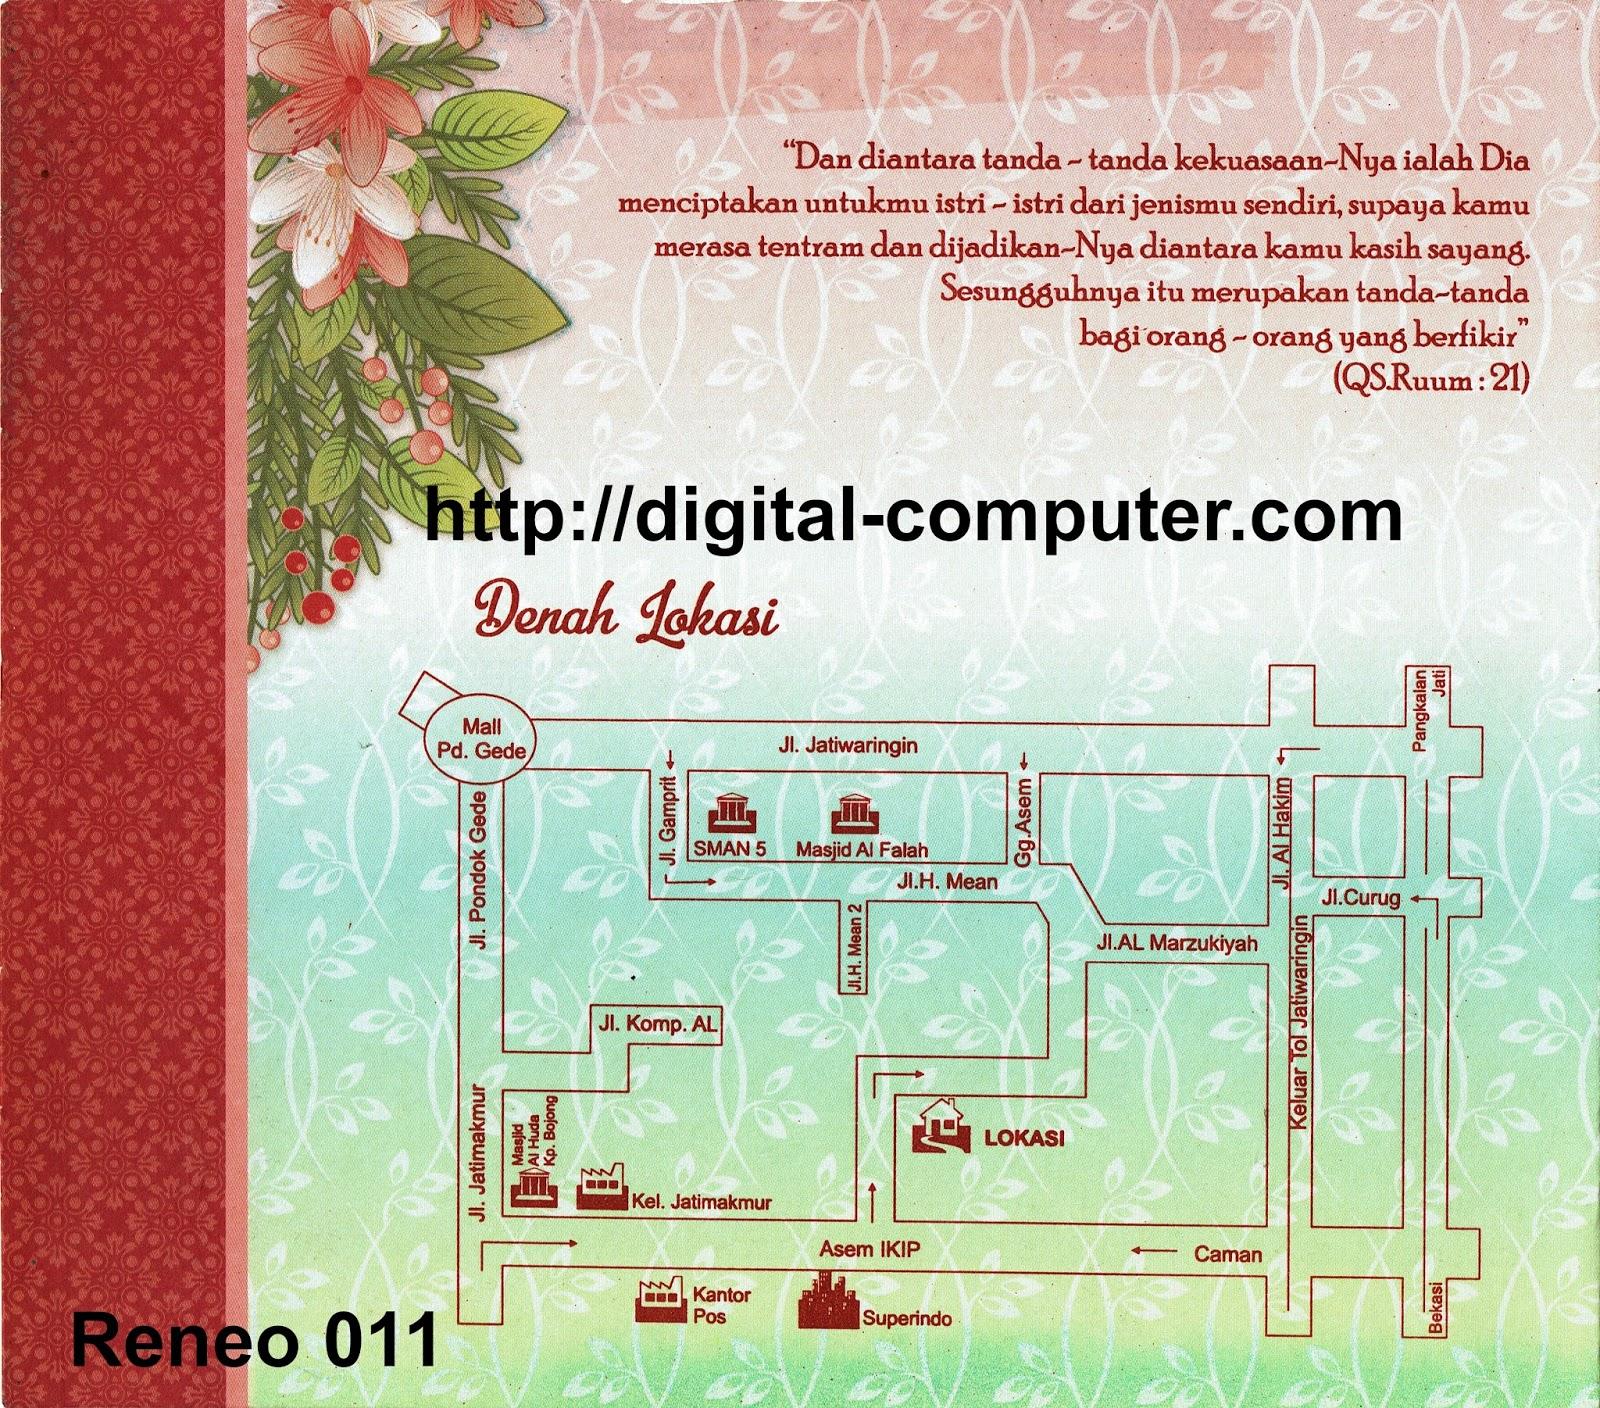 Undangan Softcover Reneo 011